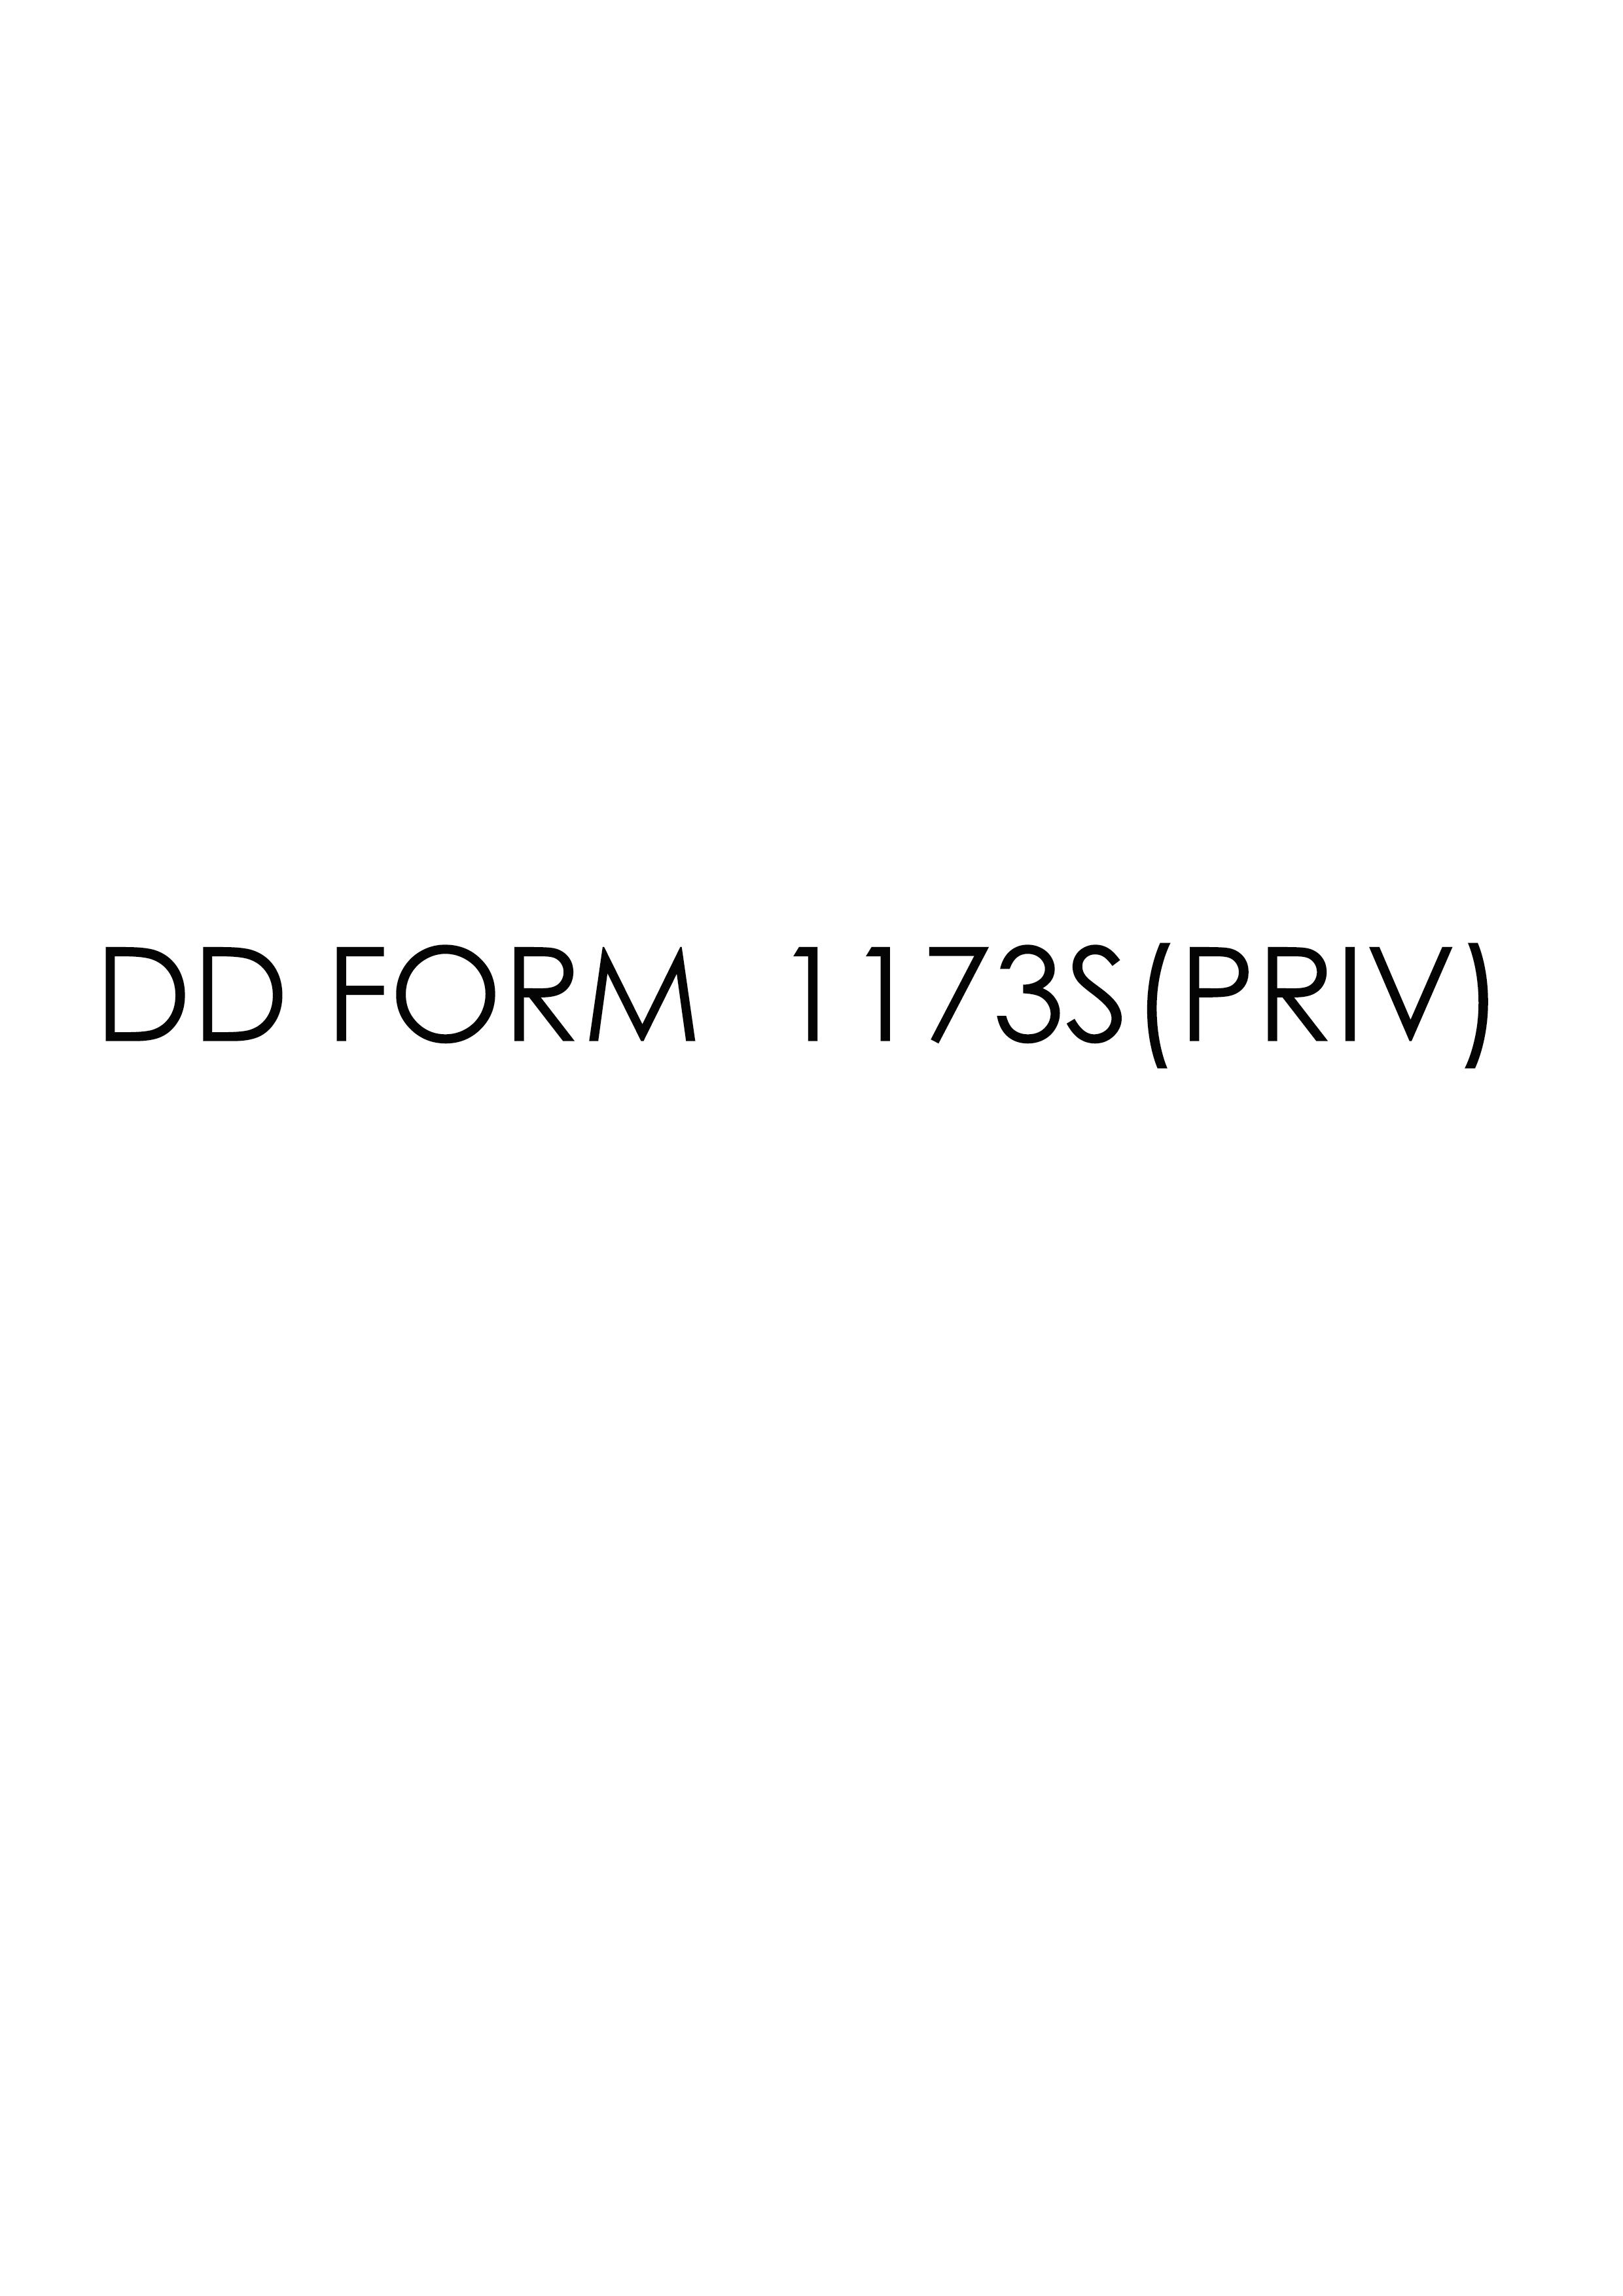 Download dd Form 1173S(PRIV) Free